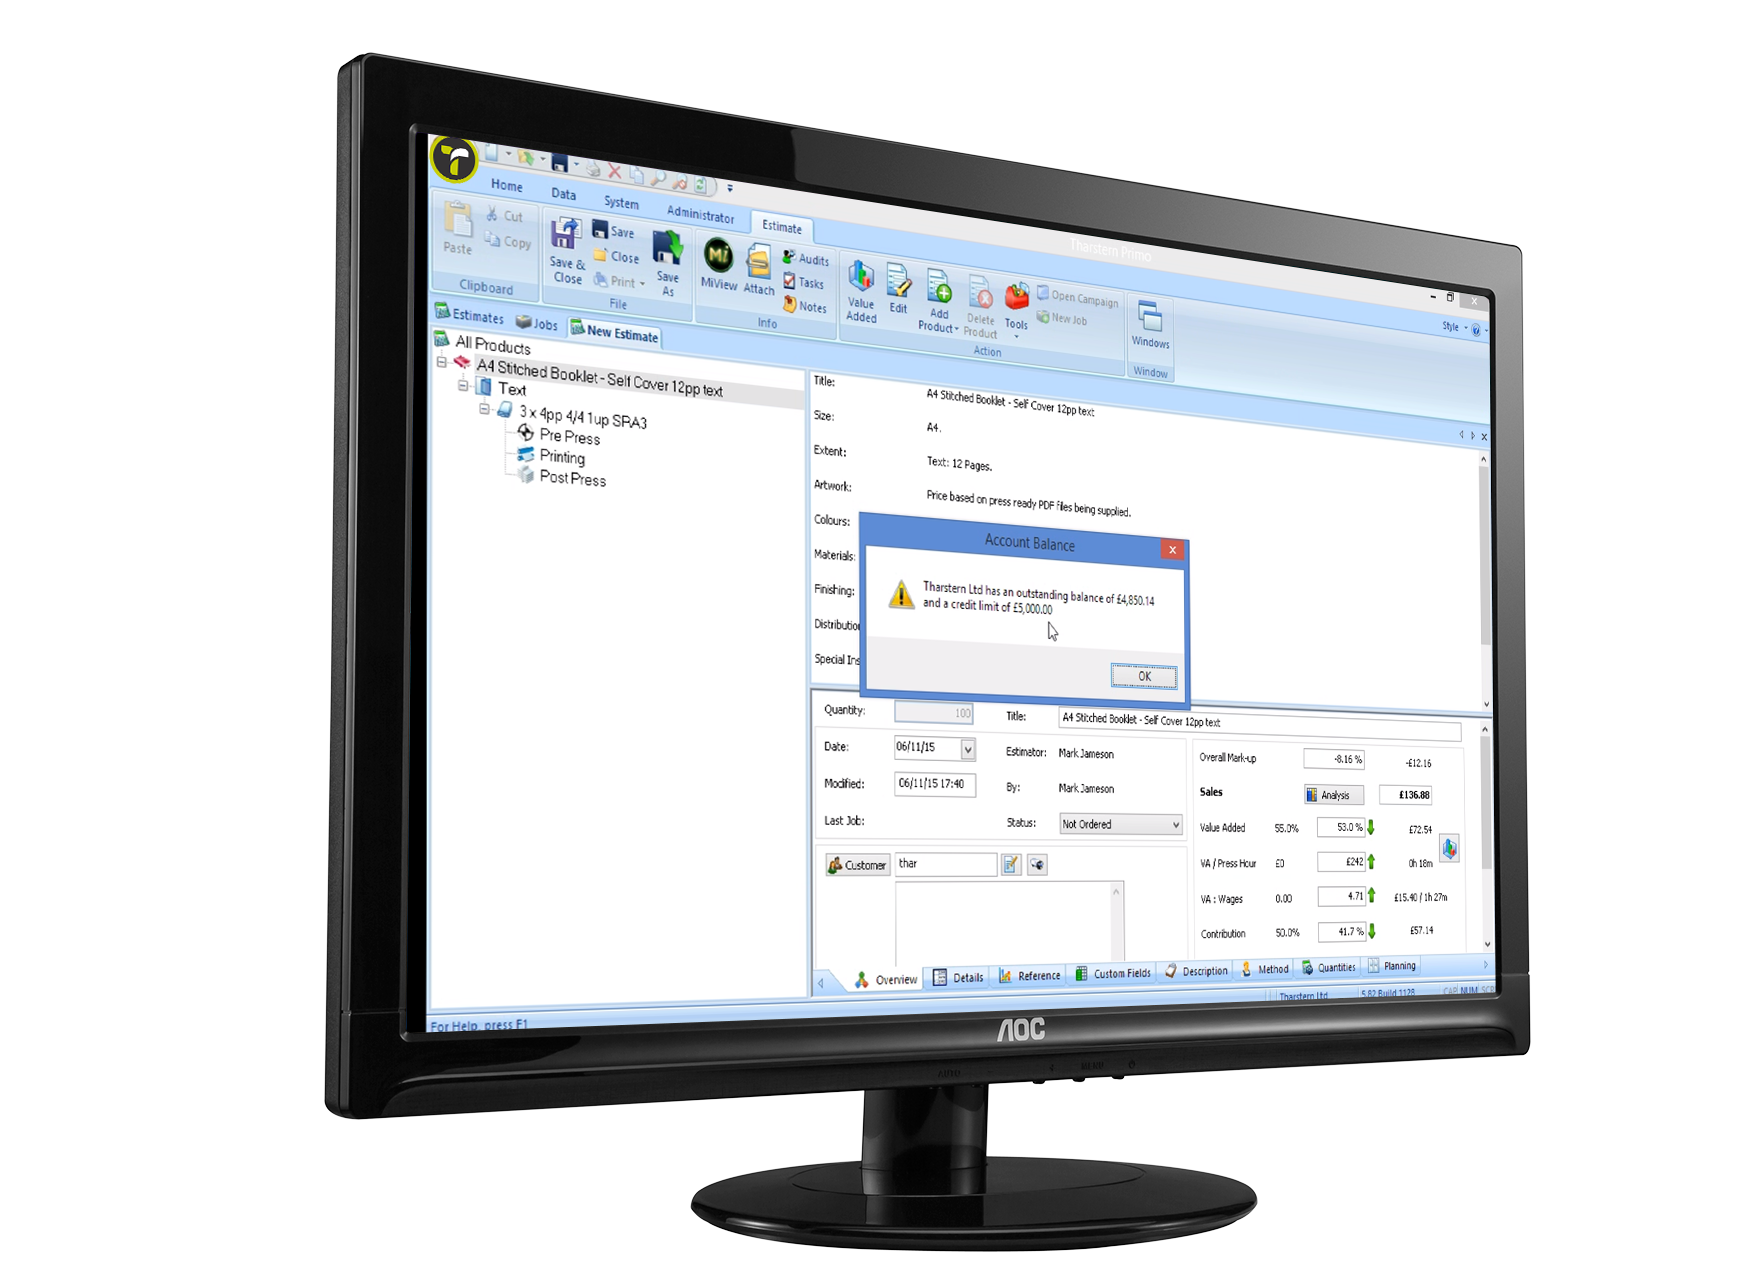 MIS integration Xero screenshot on computer screen